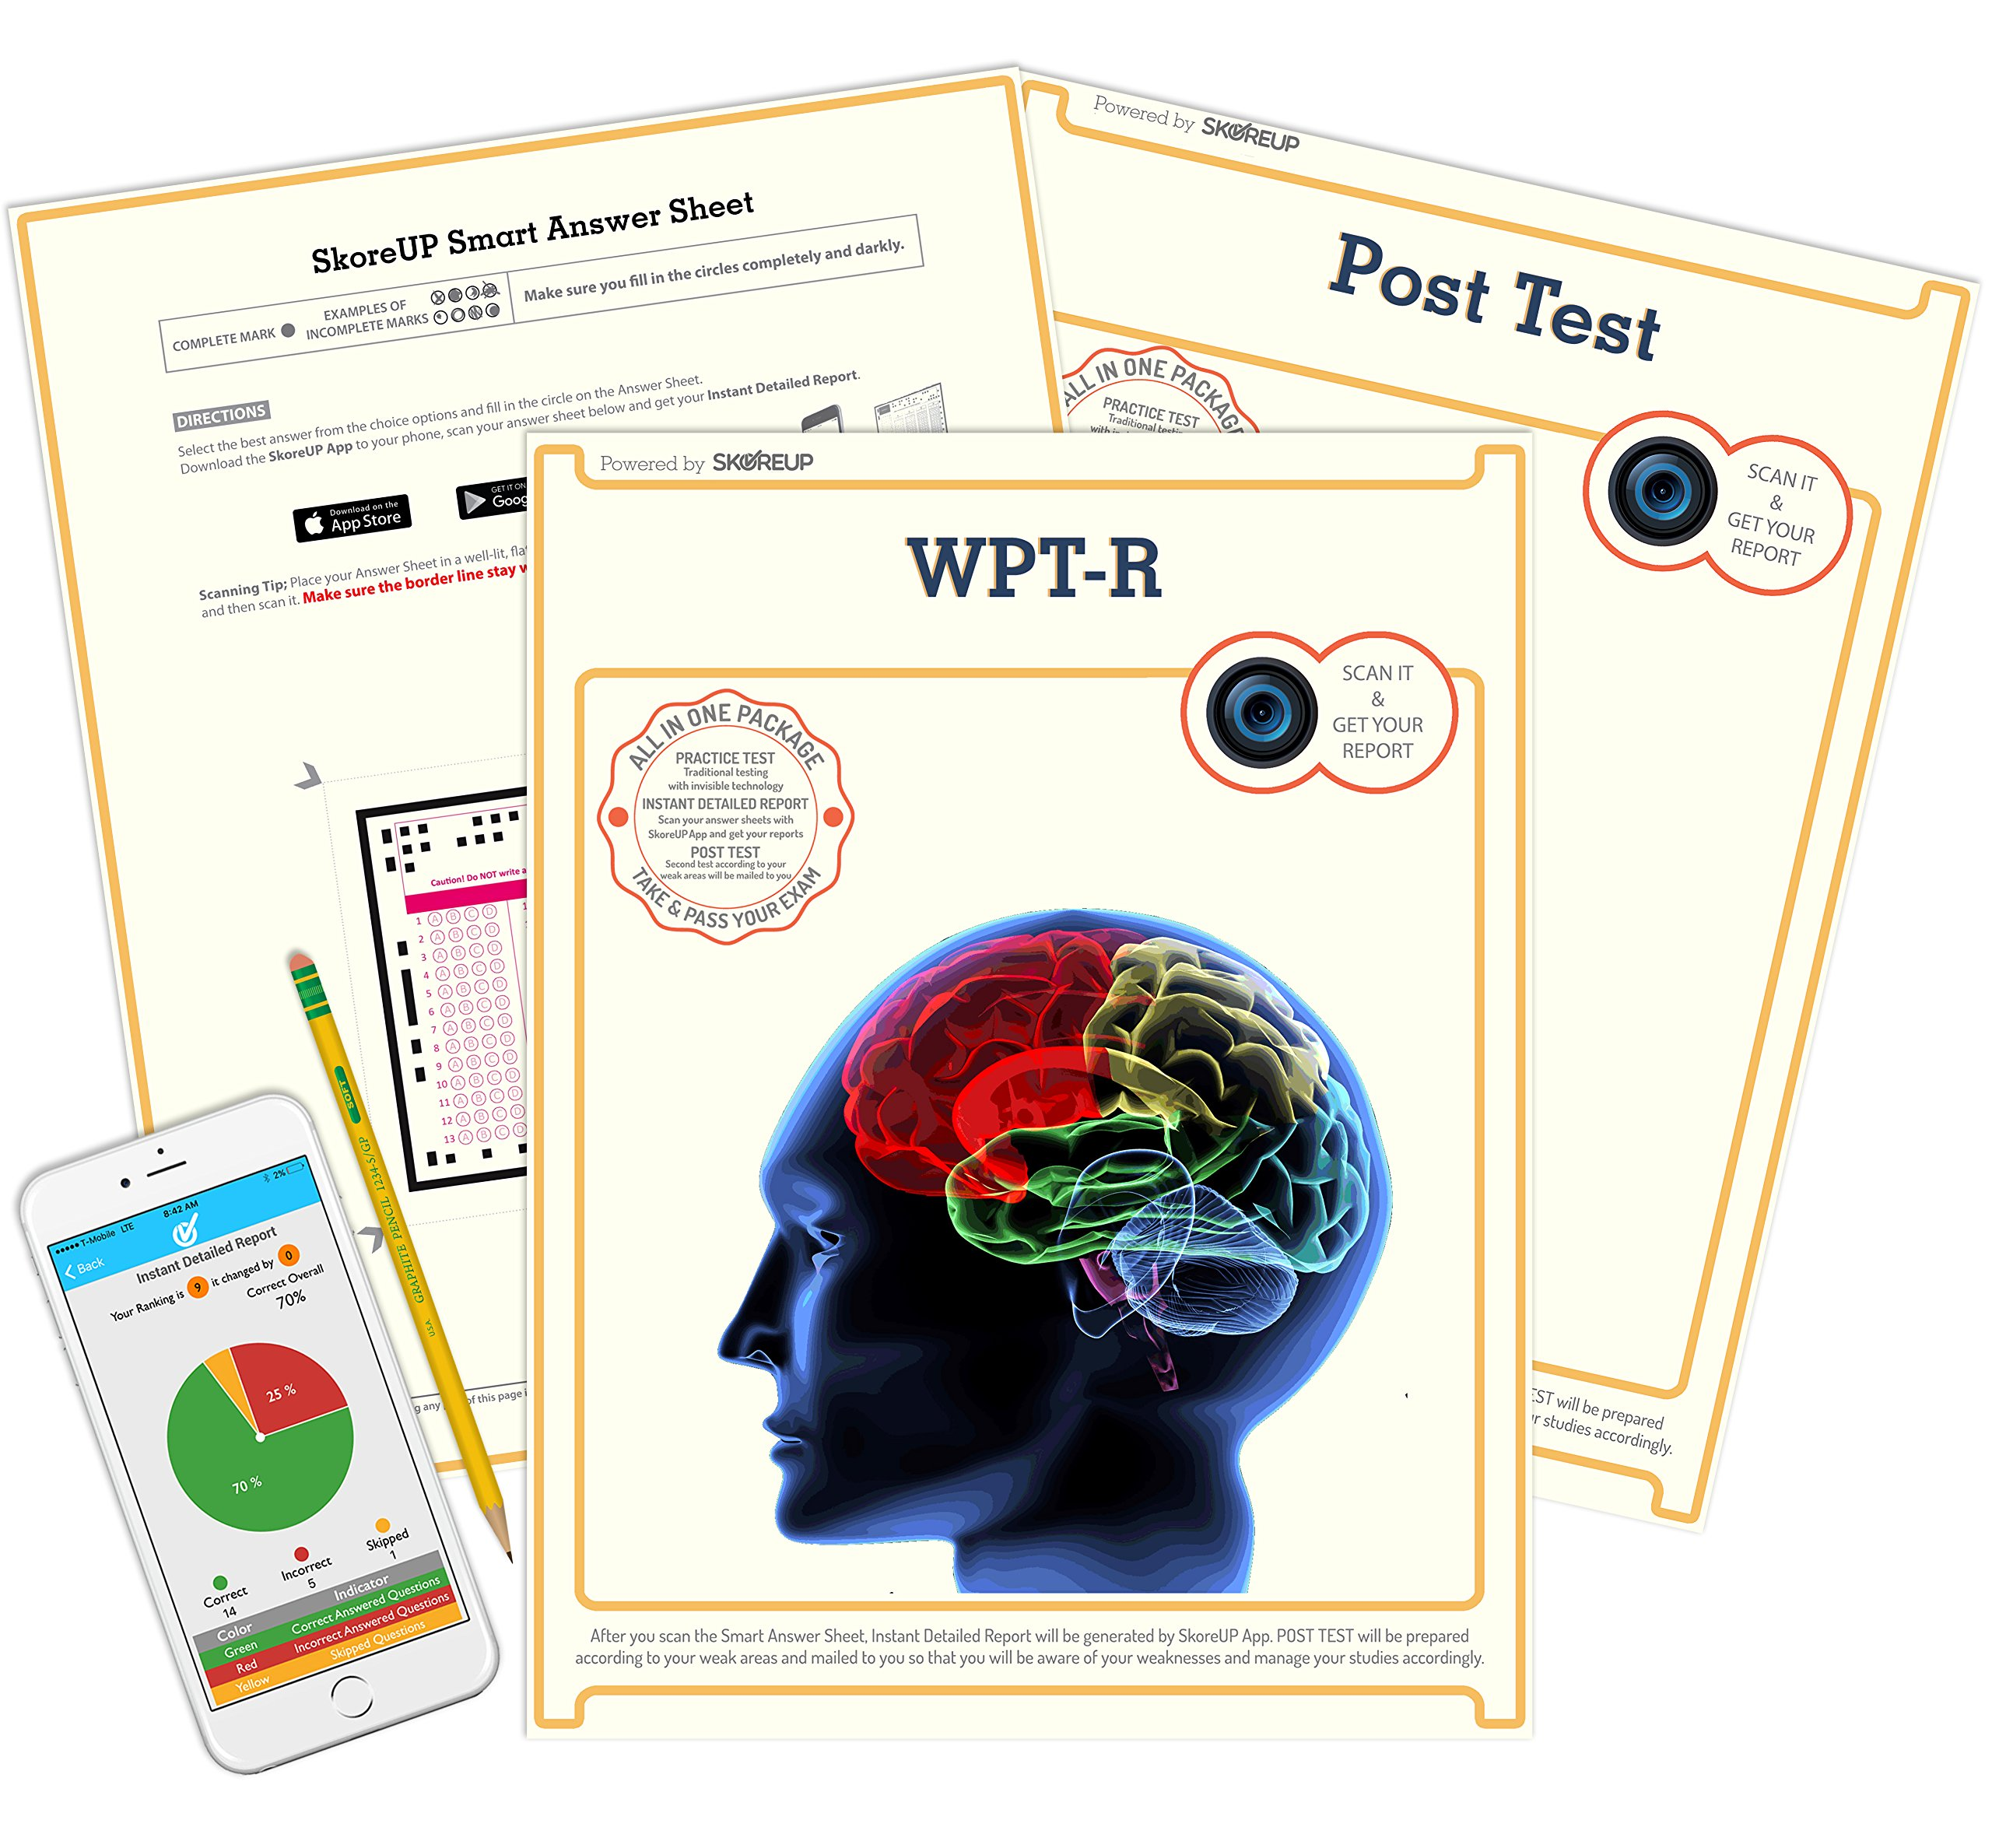 Amazon.com: Wonderlic Personnel WPT-R Exam, Test Prep, Study ...